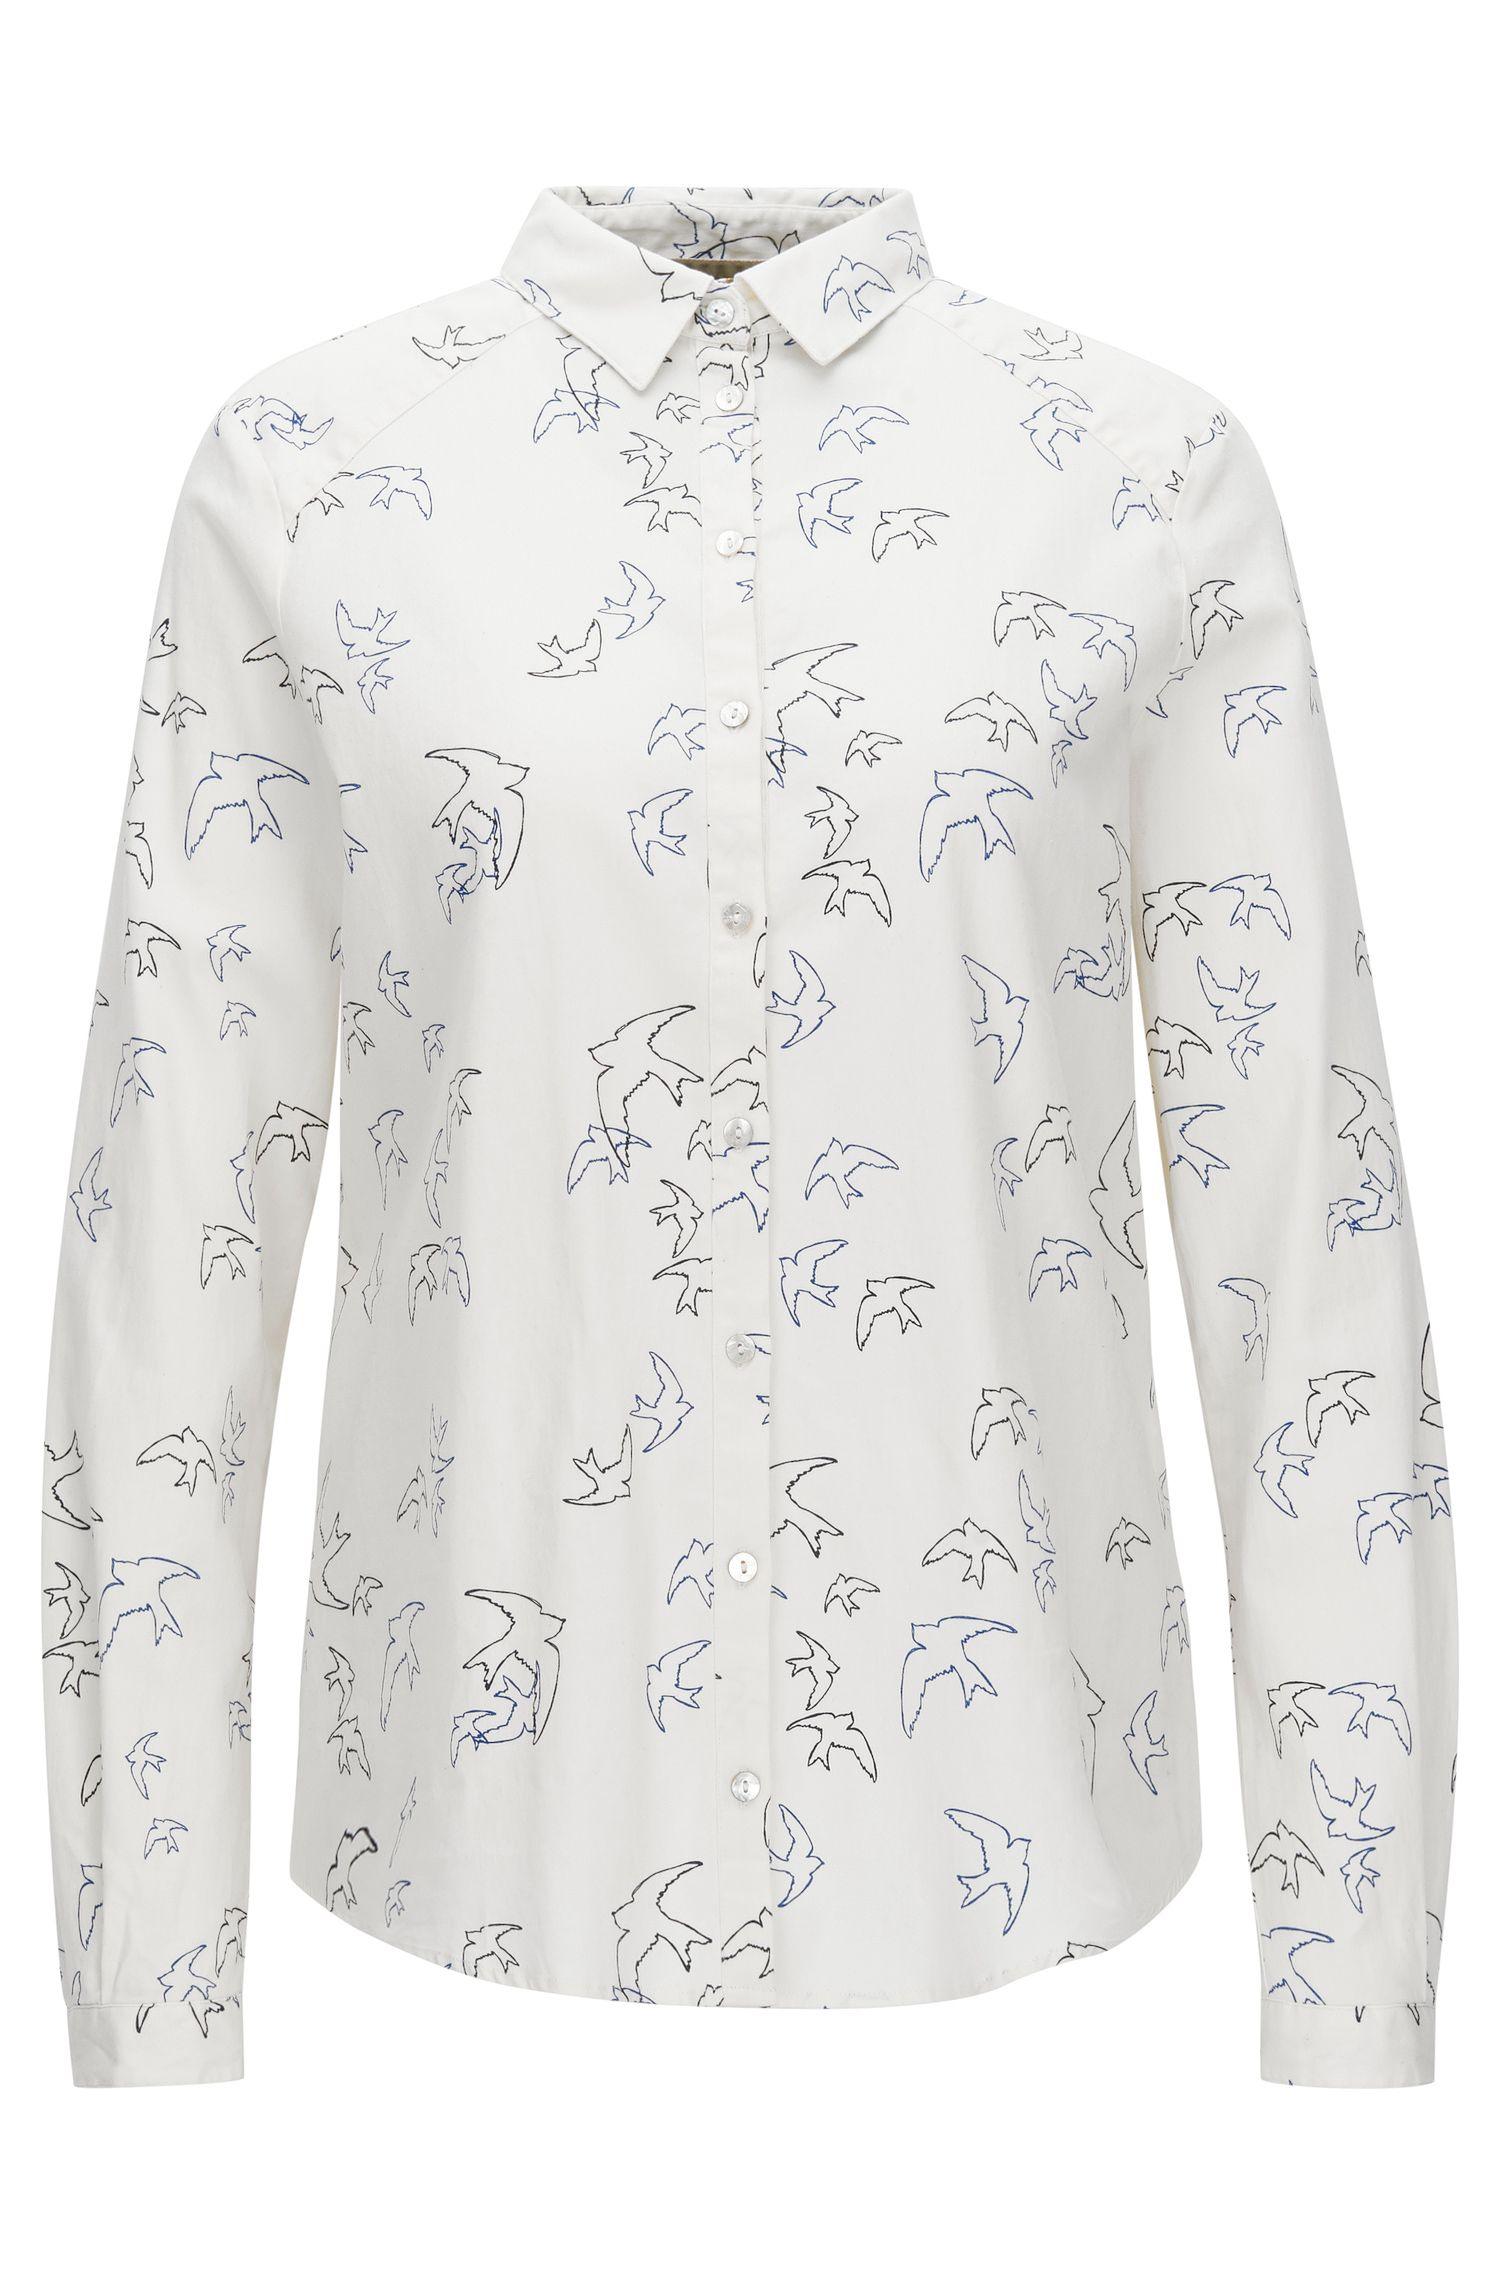 Blusa regular fit en algodón elástico